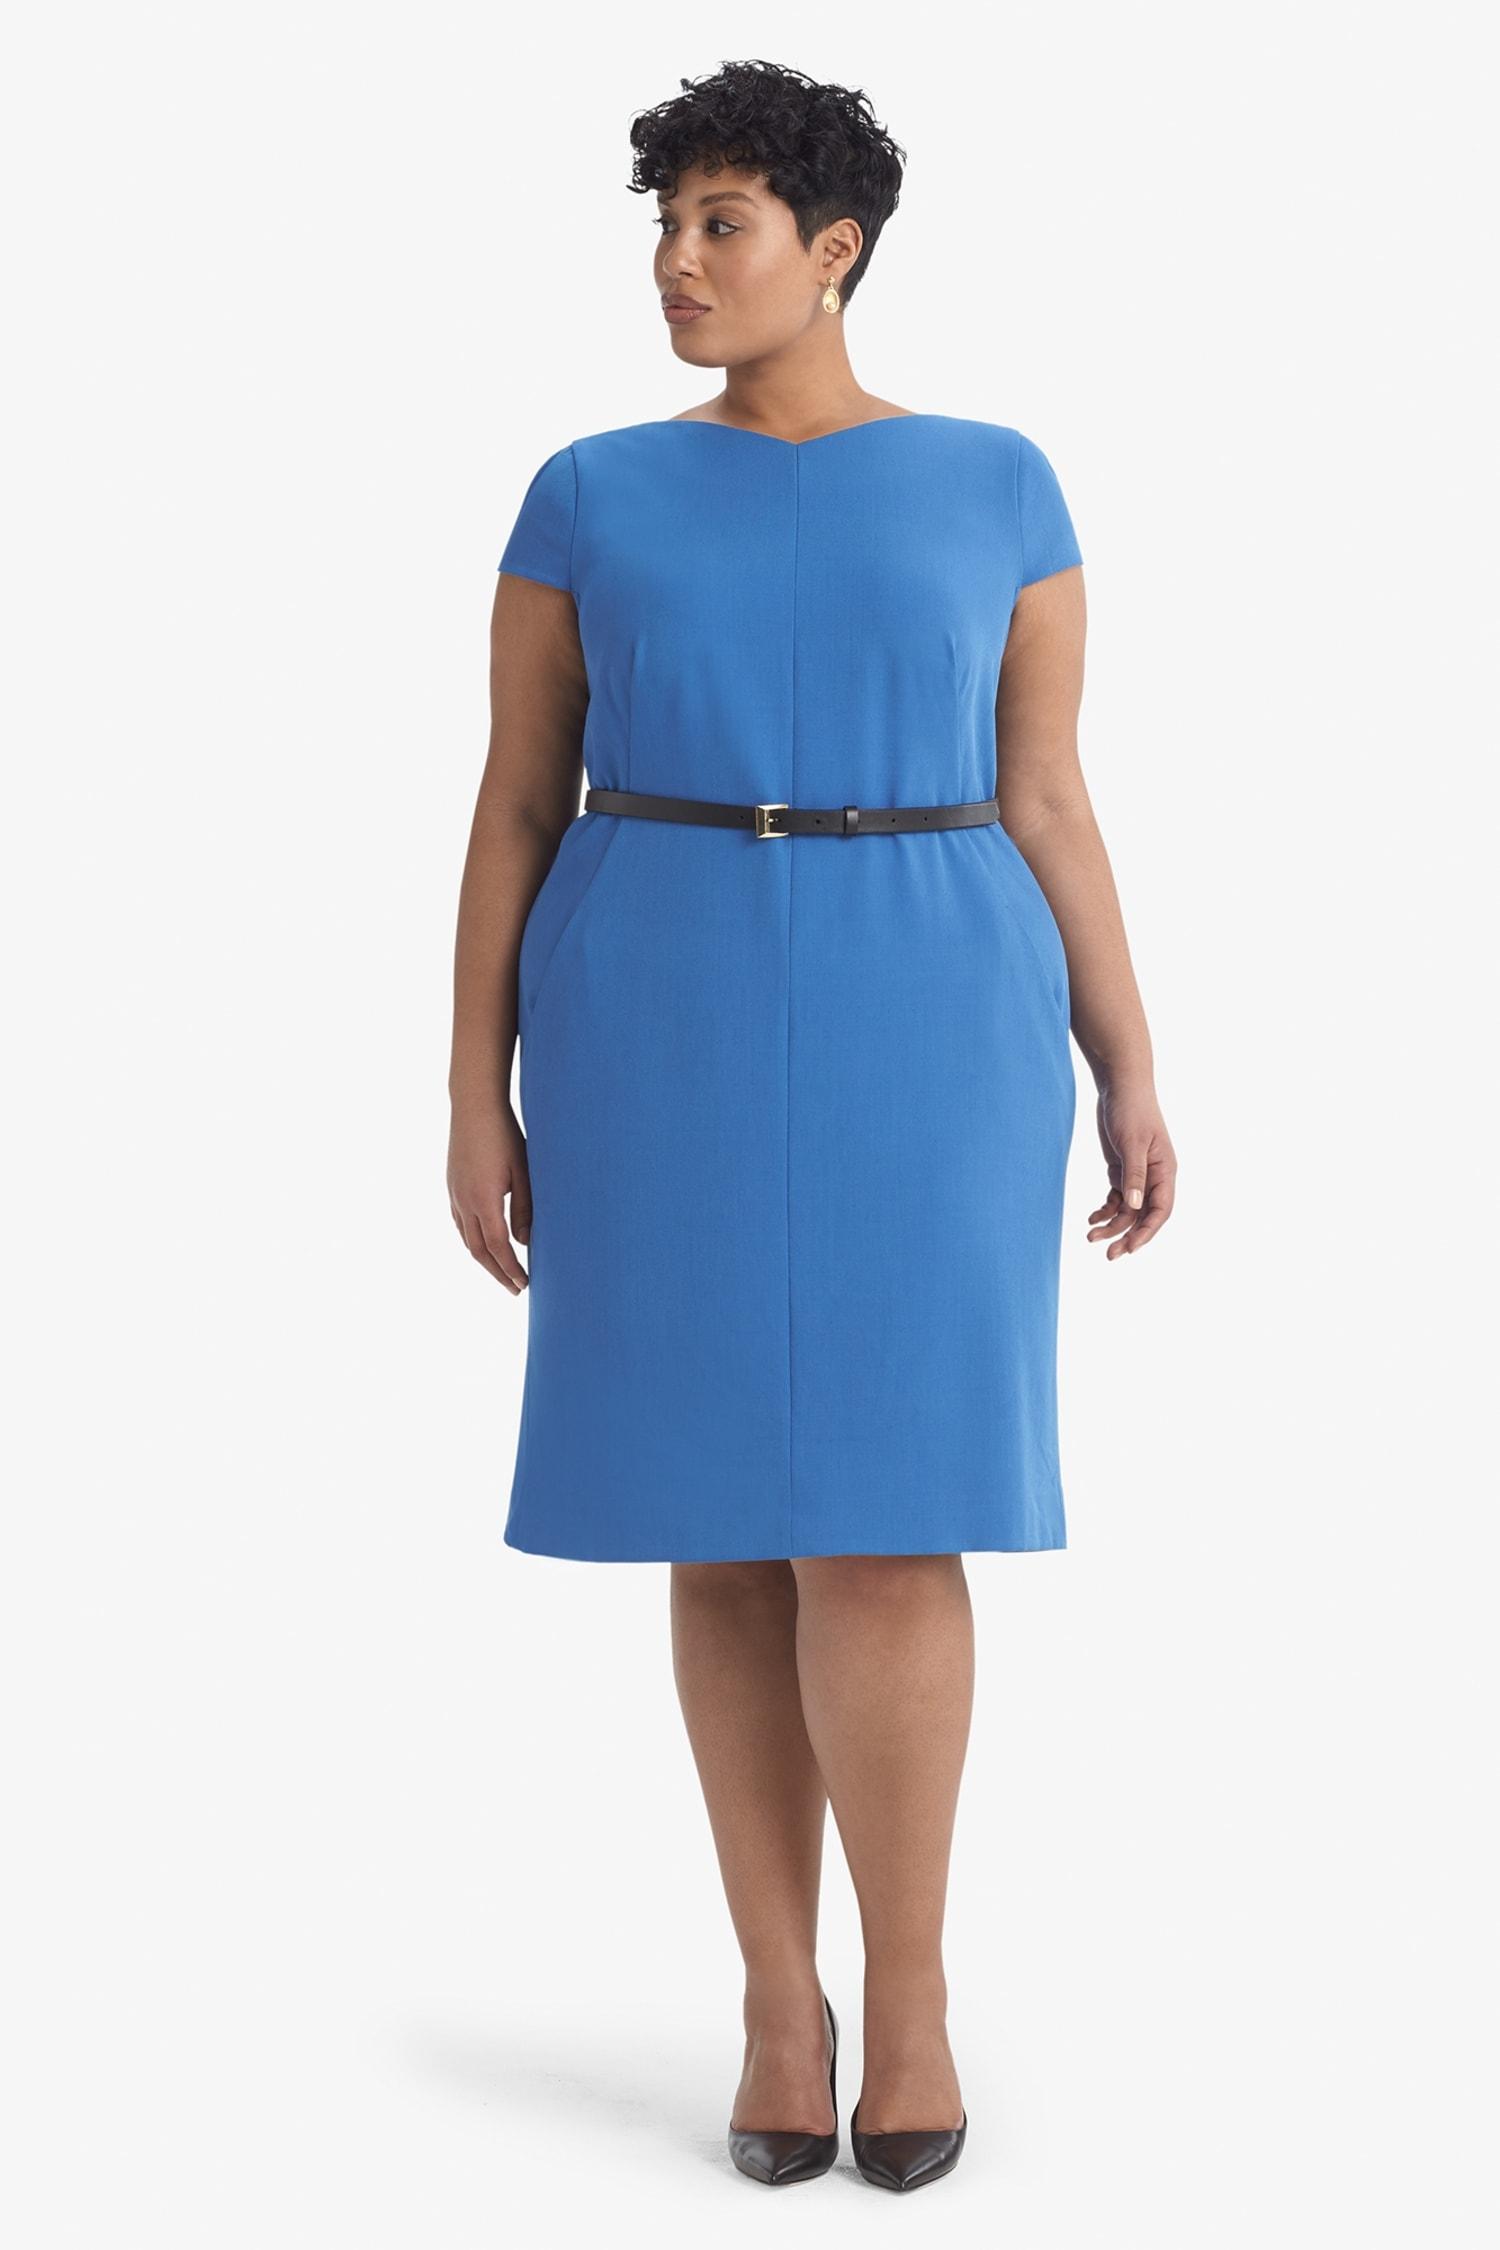 Cerulean Dress